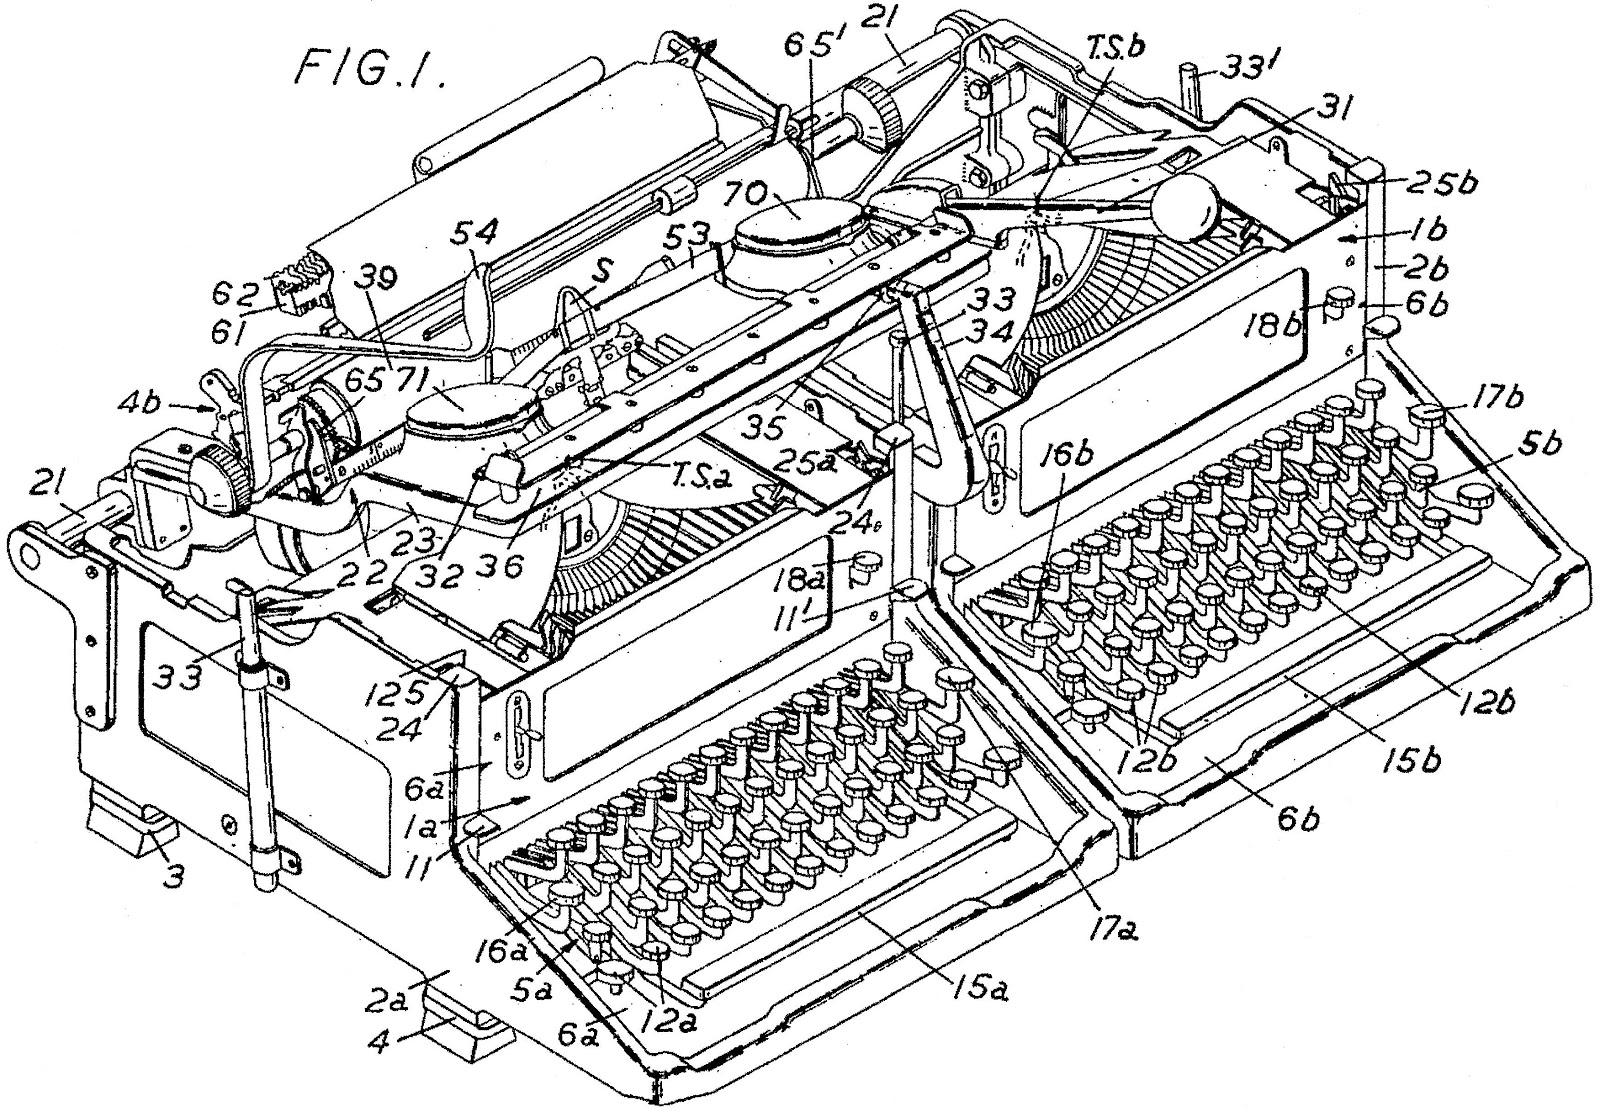 oz.Typewriter: On This Day in Typewriter History: The